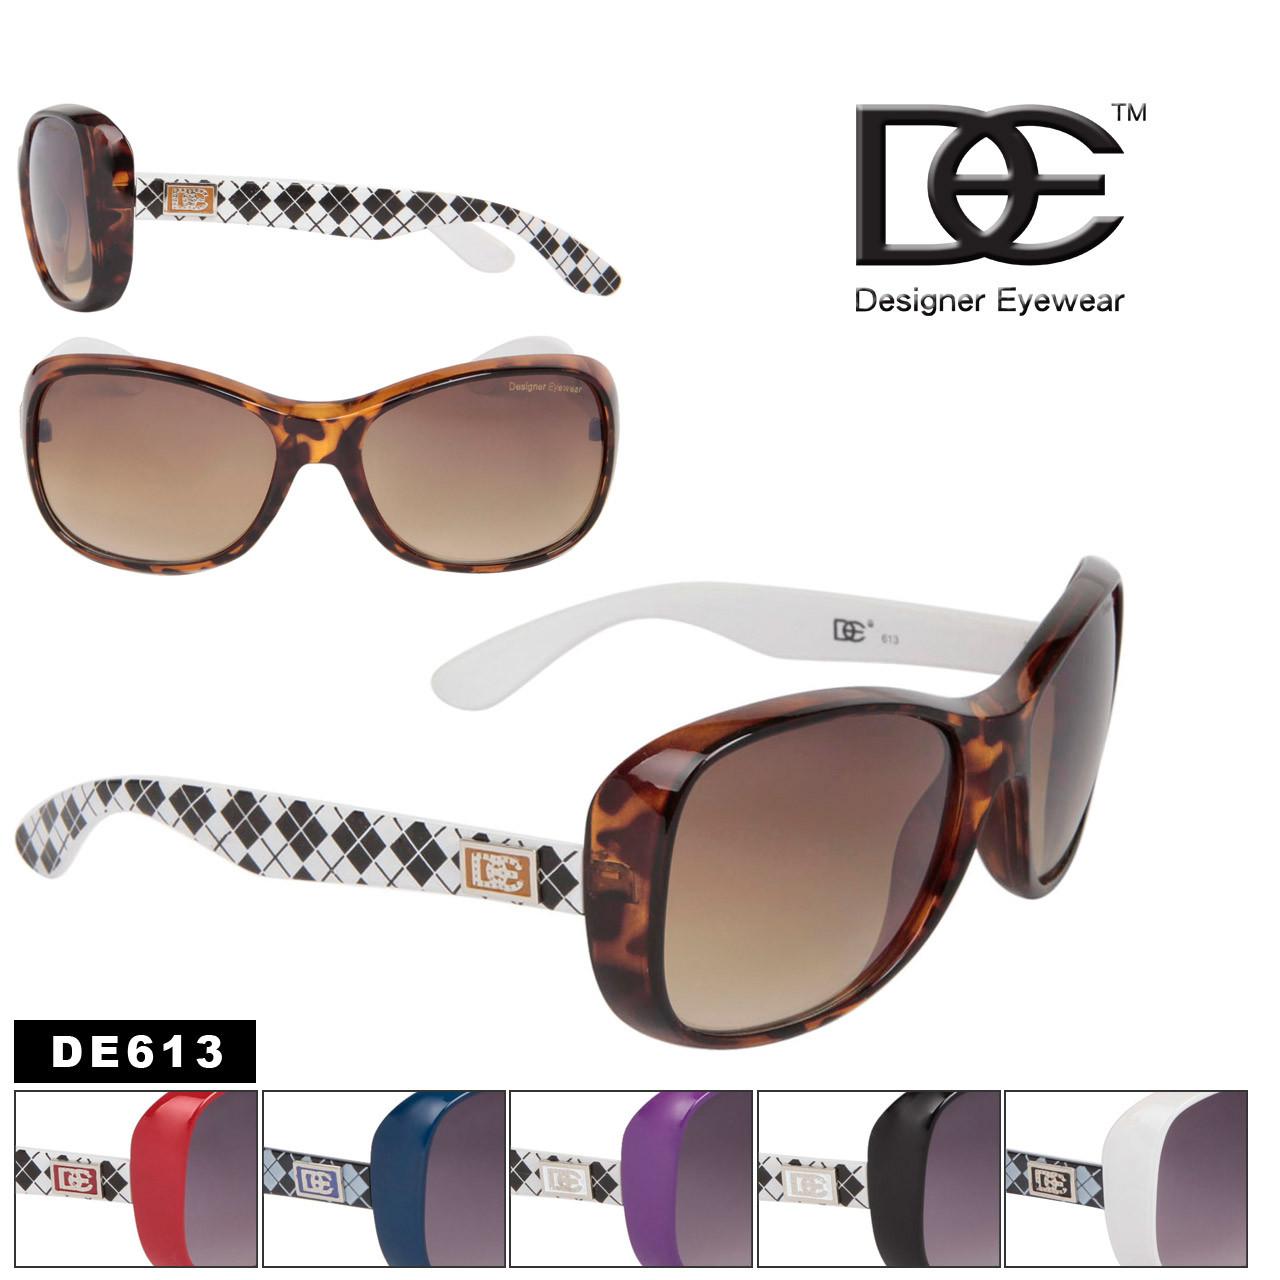 401f4b674b23 Bulk Designer Sunglasses DE™ - Style  DE613